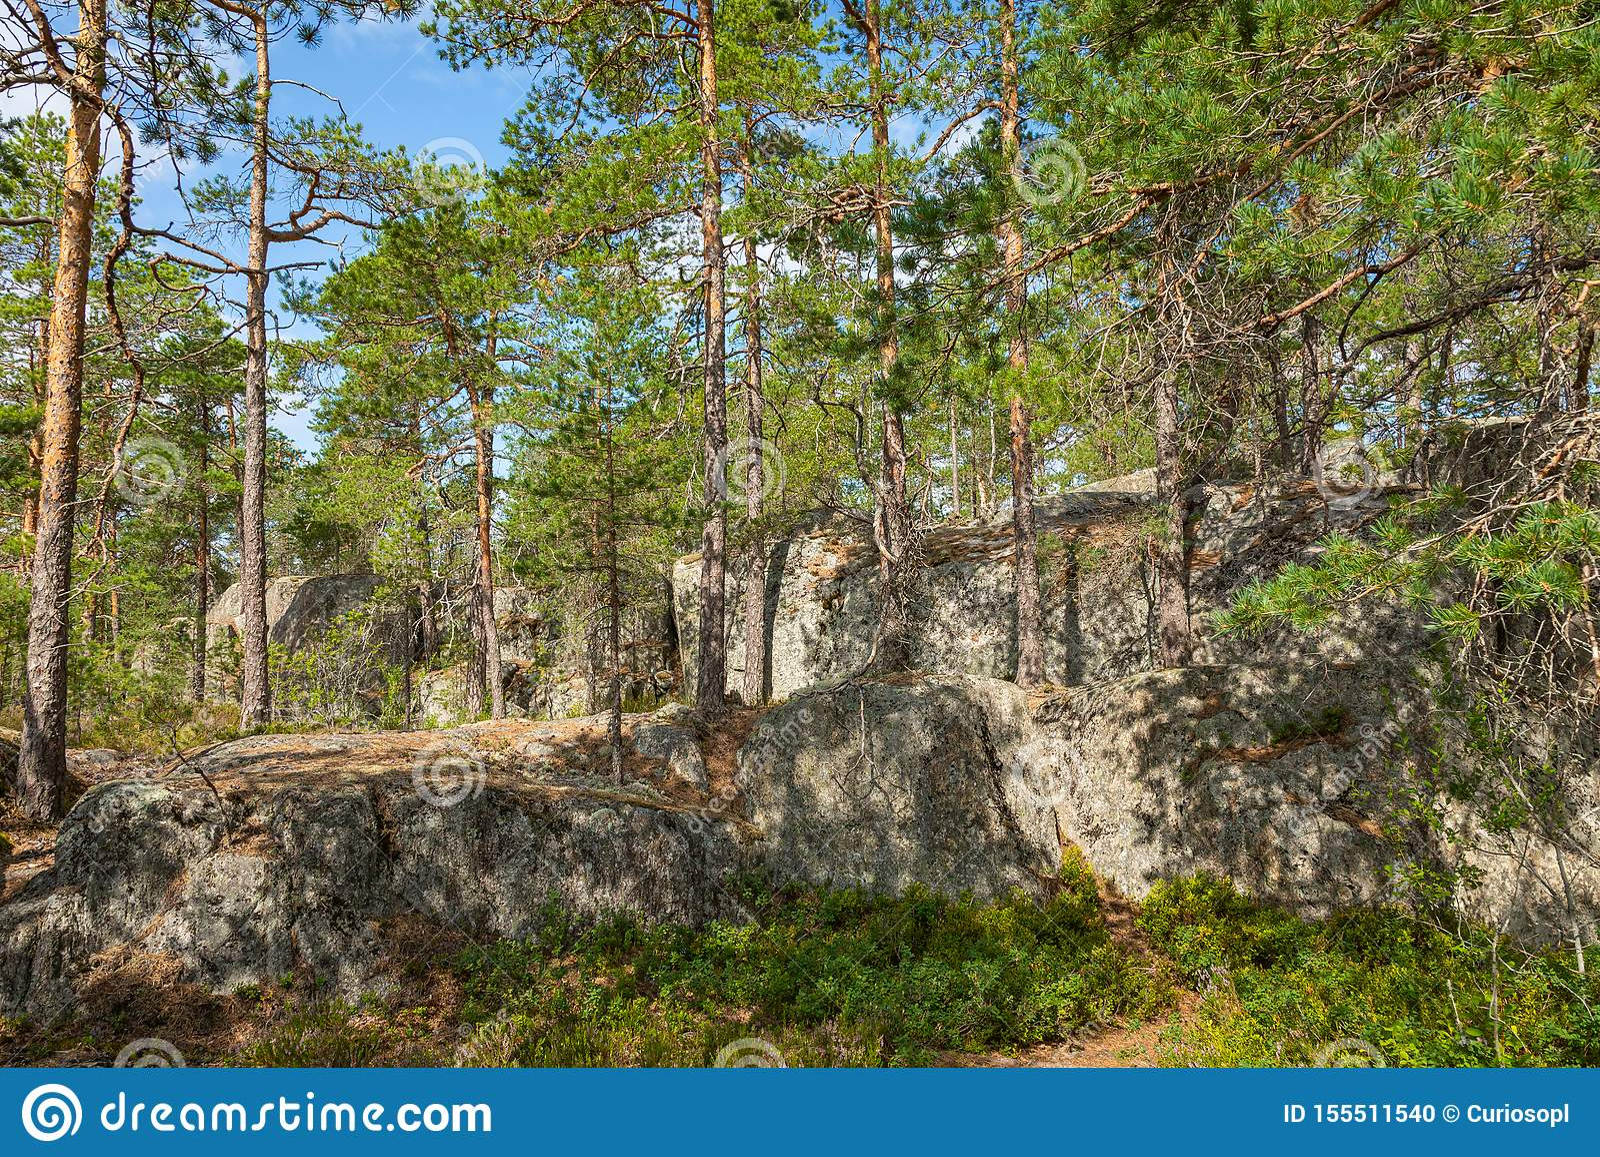 Kurjenrahka National Park. Nature trail. Green forest at summer time. Turku, Finland. Nordic natural landscape. Scandinavian